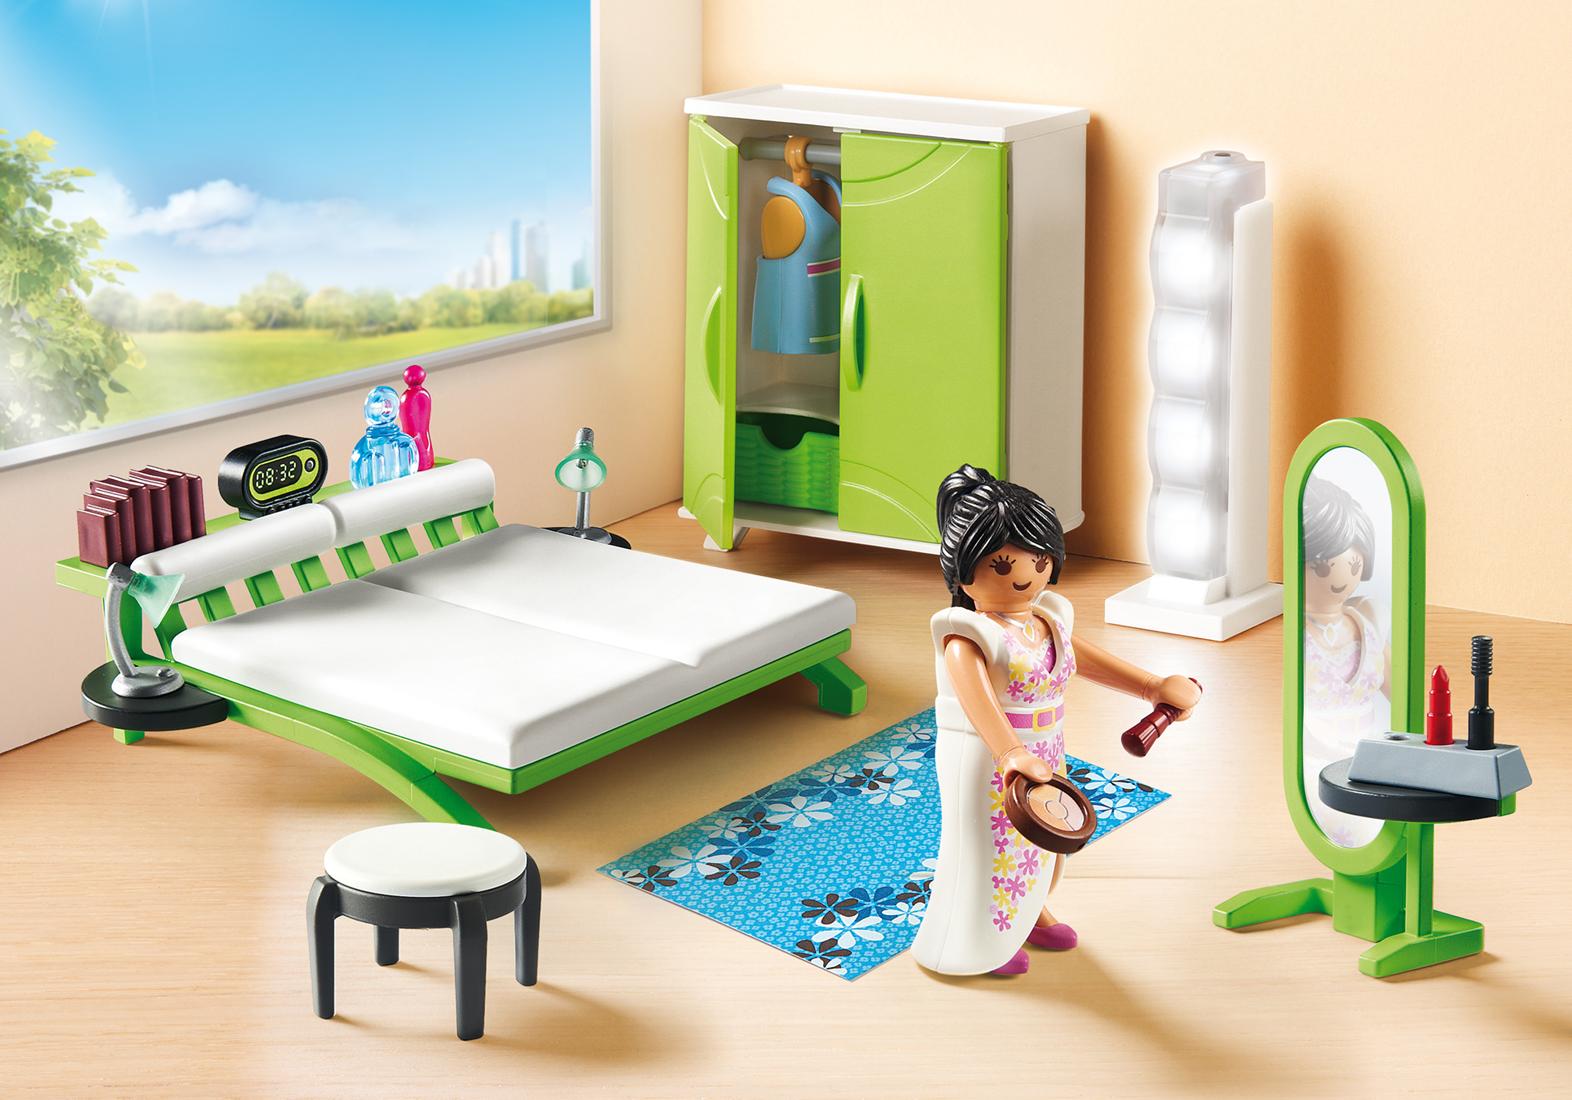 Make Up Tafel : Playmobil city life slaapkamer met make up tafel planet